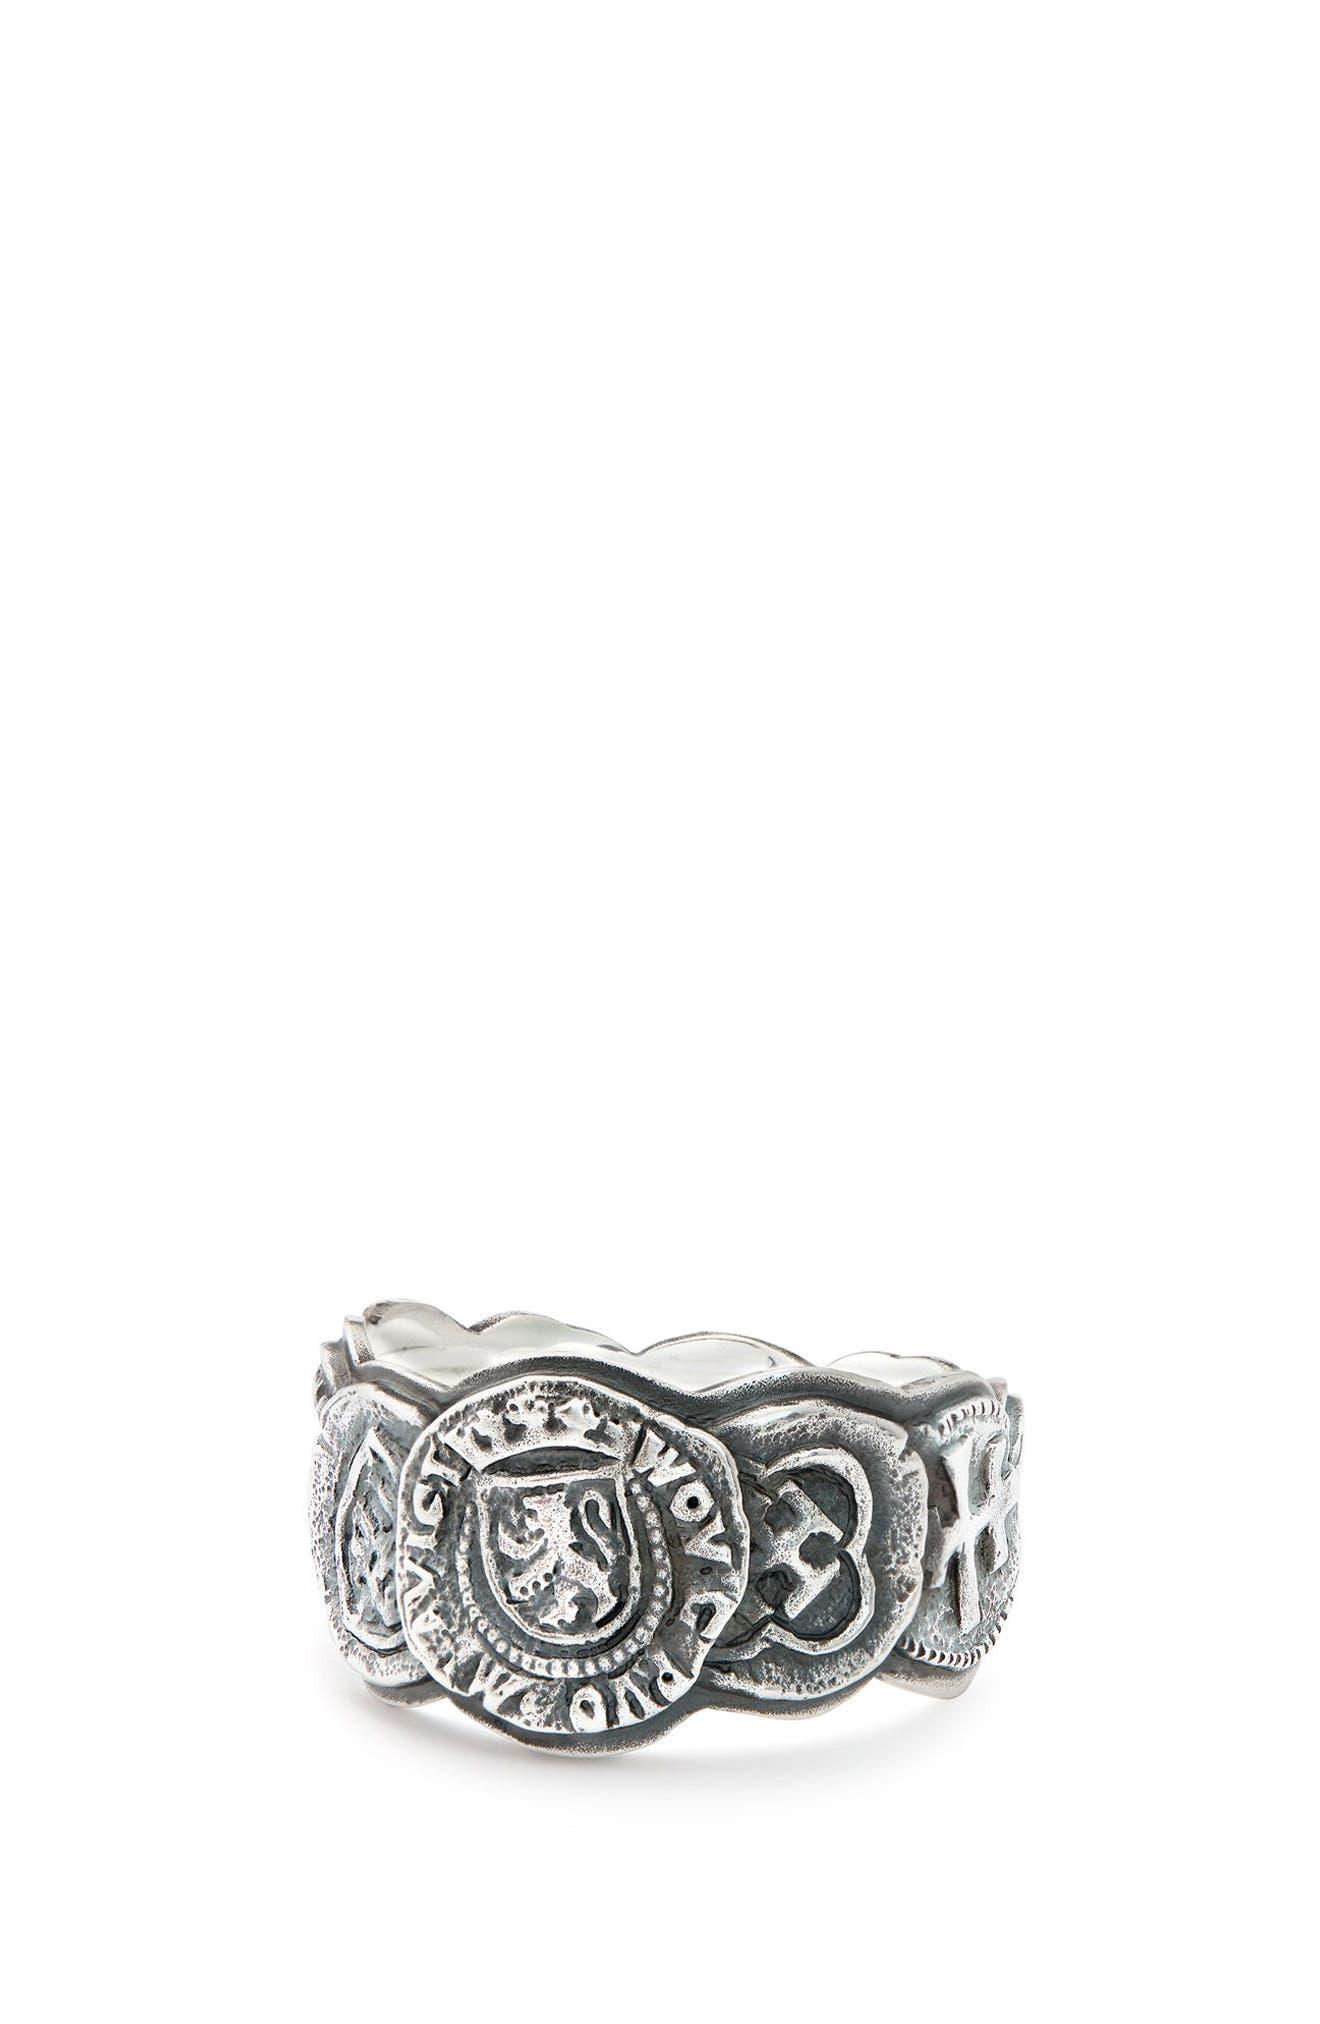 David Yurman Shipwreck Coin Band Ring, 12mm